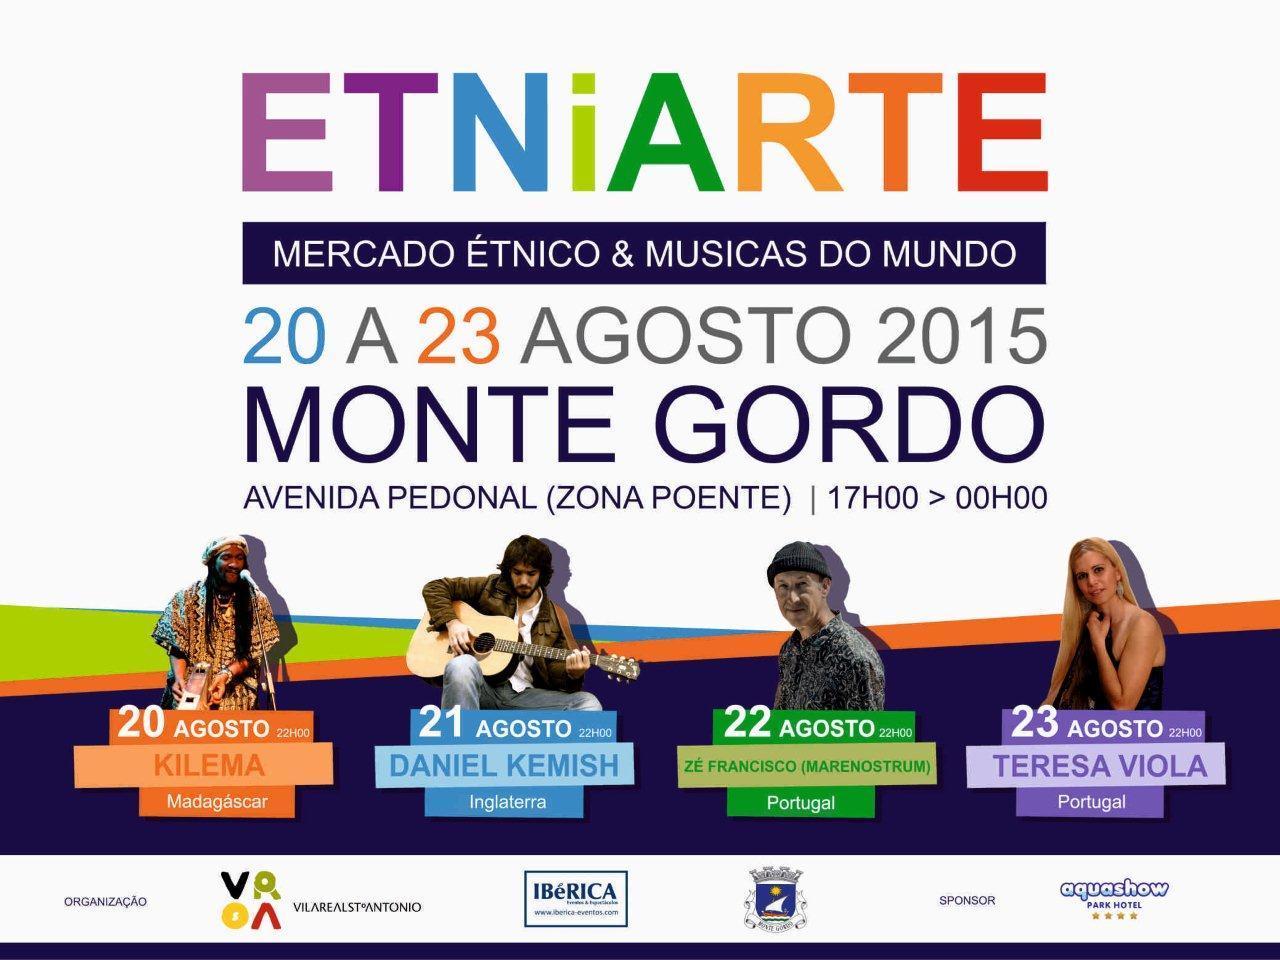 Etniarte 2015